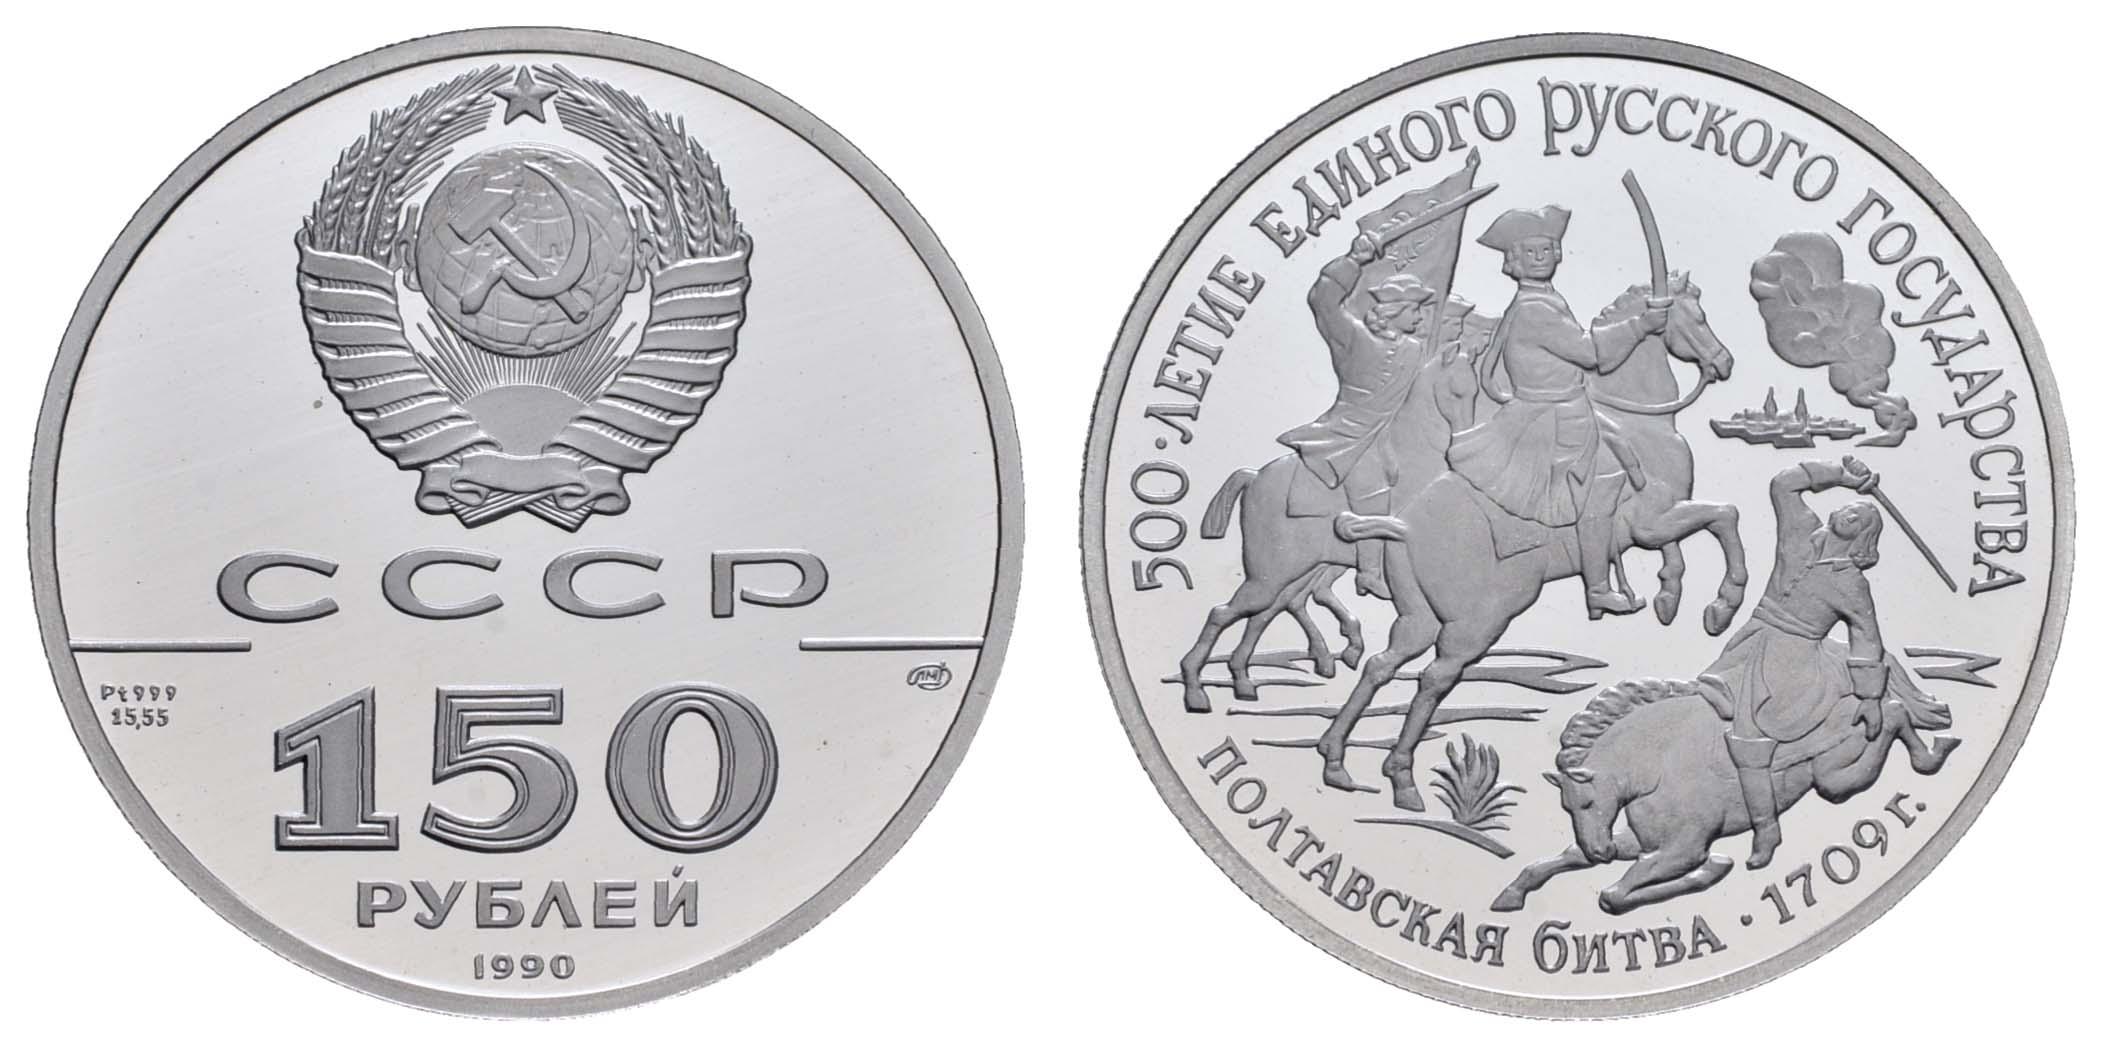 Lot 1771 - europa ab 1800 - Russland -  Auktionshaus Ulrich Felzmann GmbH & Co. KG Coins single lots